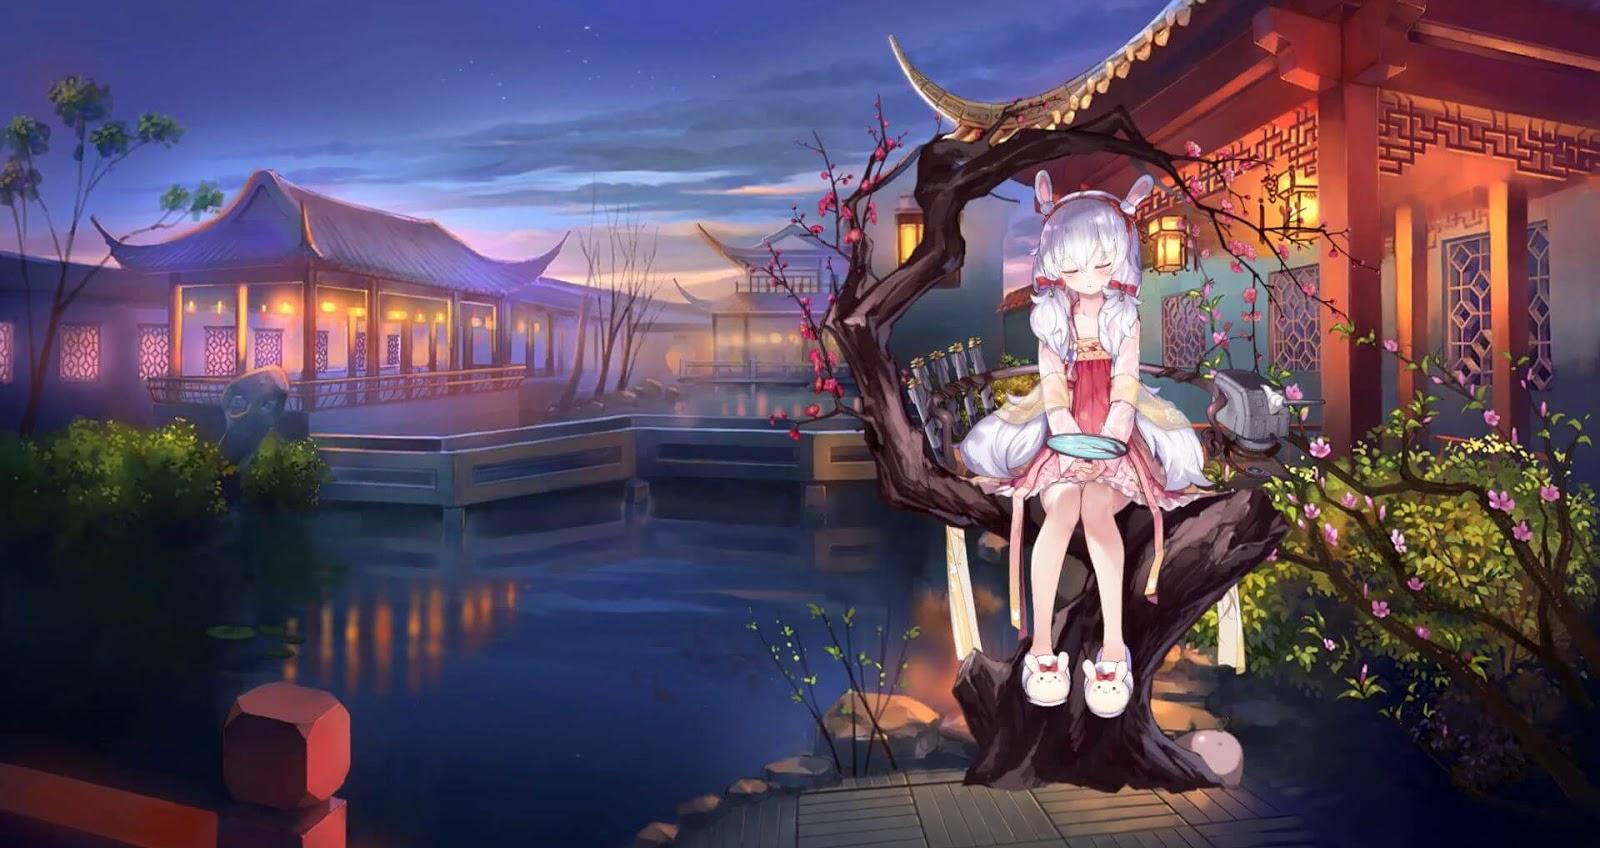 Laffey Live2D [Azur Lane] [Wallpaper Engine Anime]